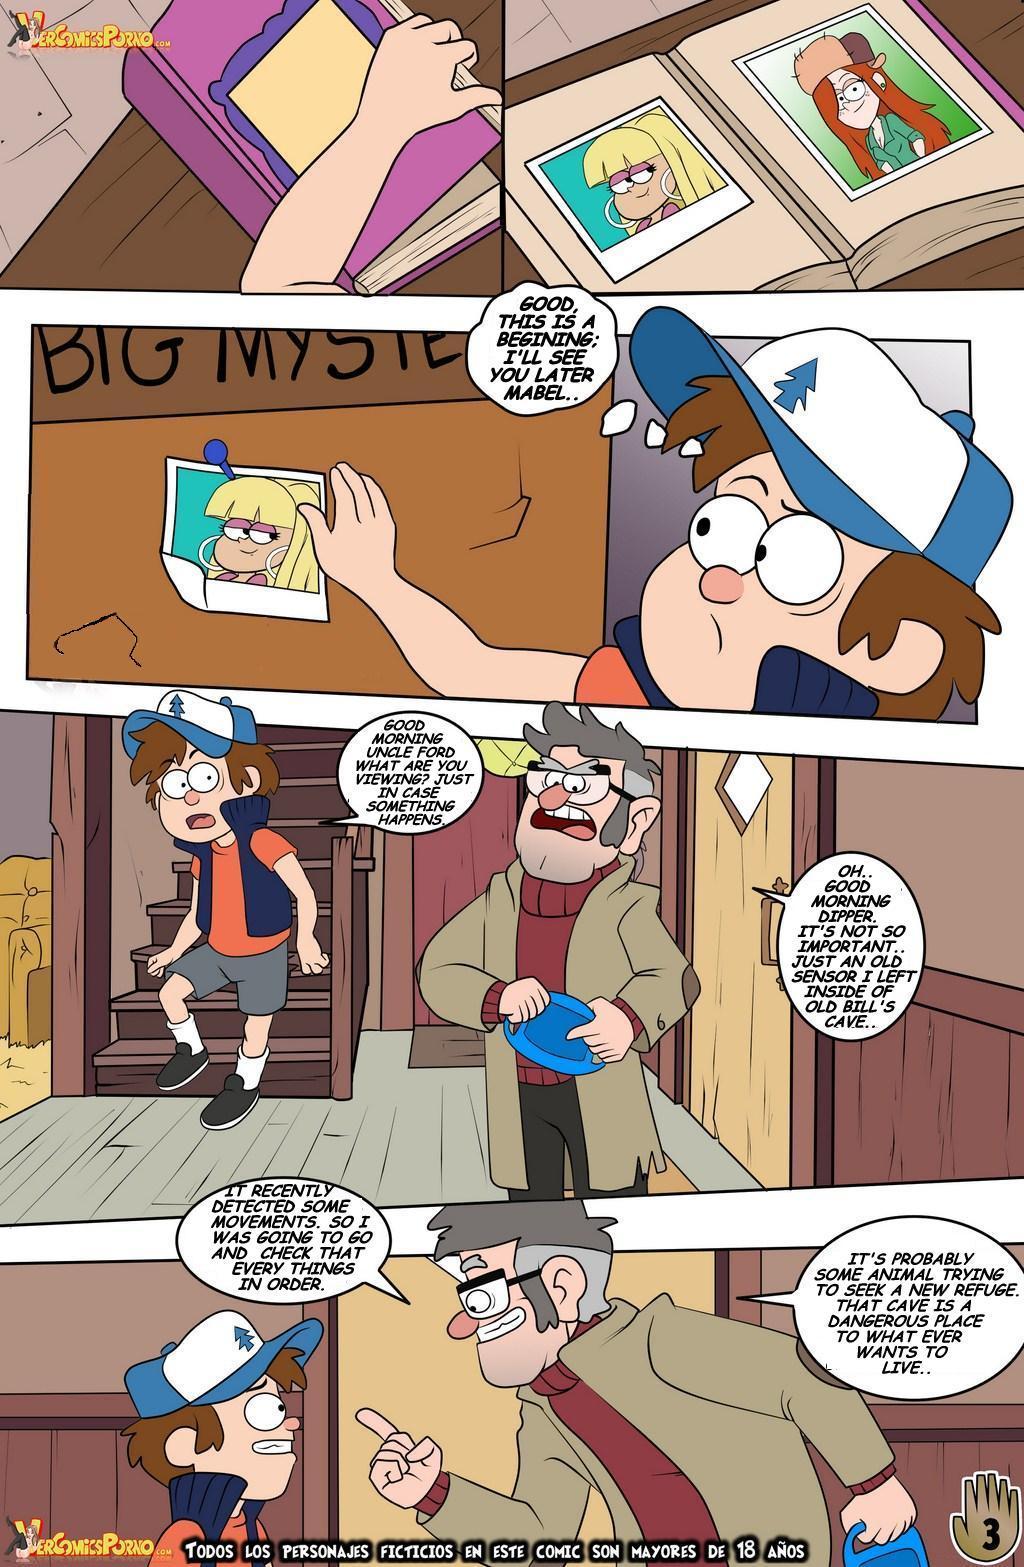 Gravity Falls- One Summer of Pleasure Book 2